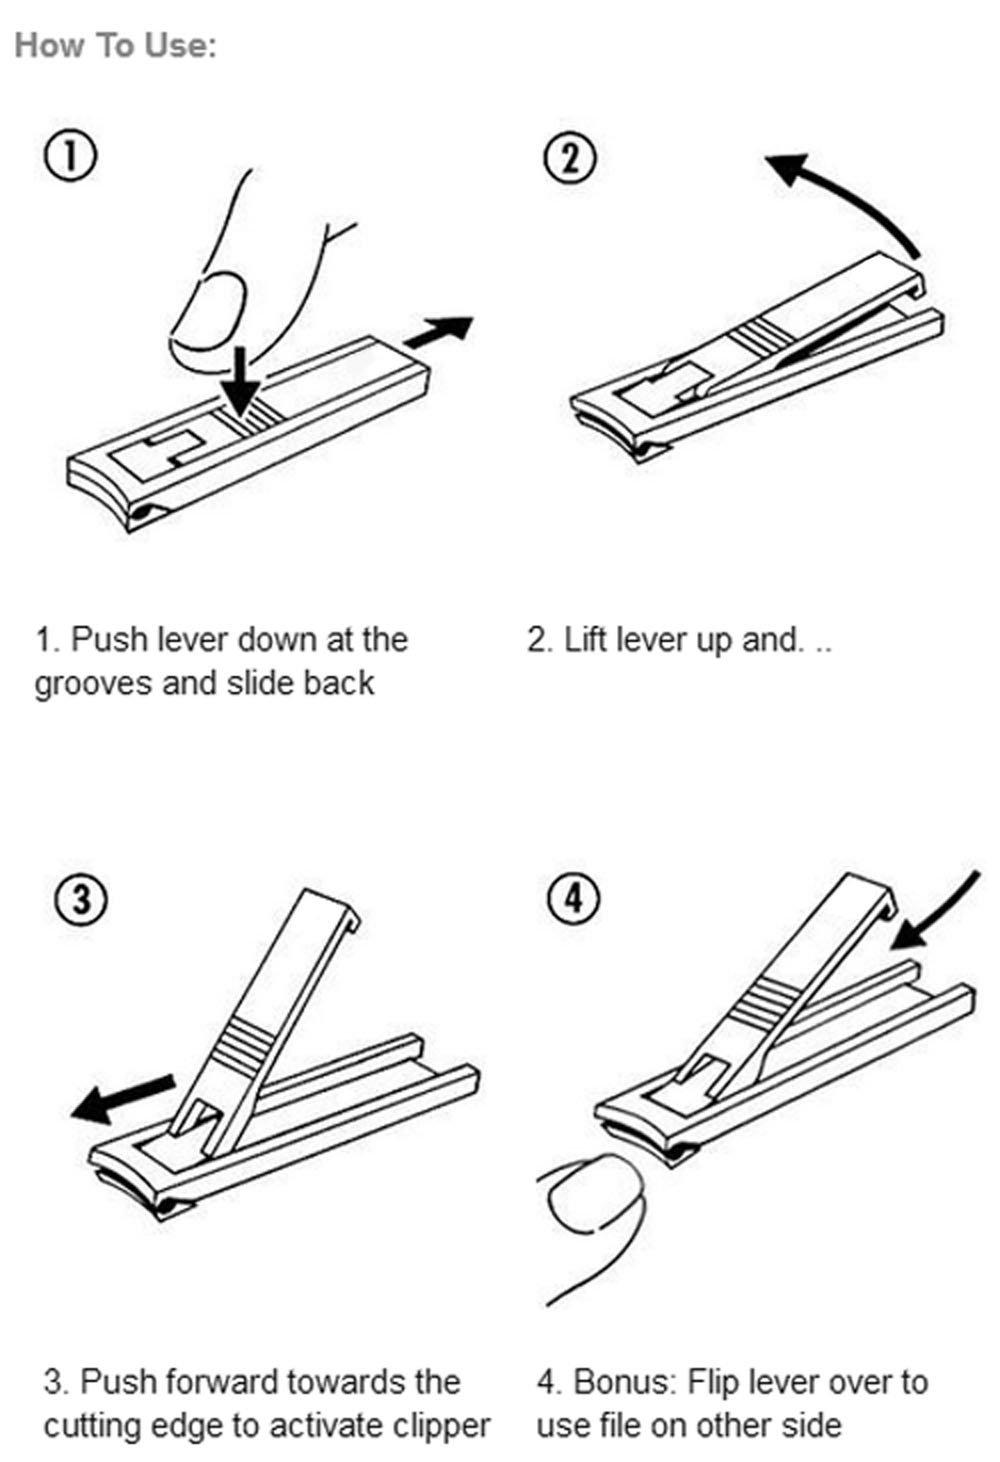 Adecco LLC Ultra-Slim Nail Clipper by Adecco LLC (Image #6)